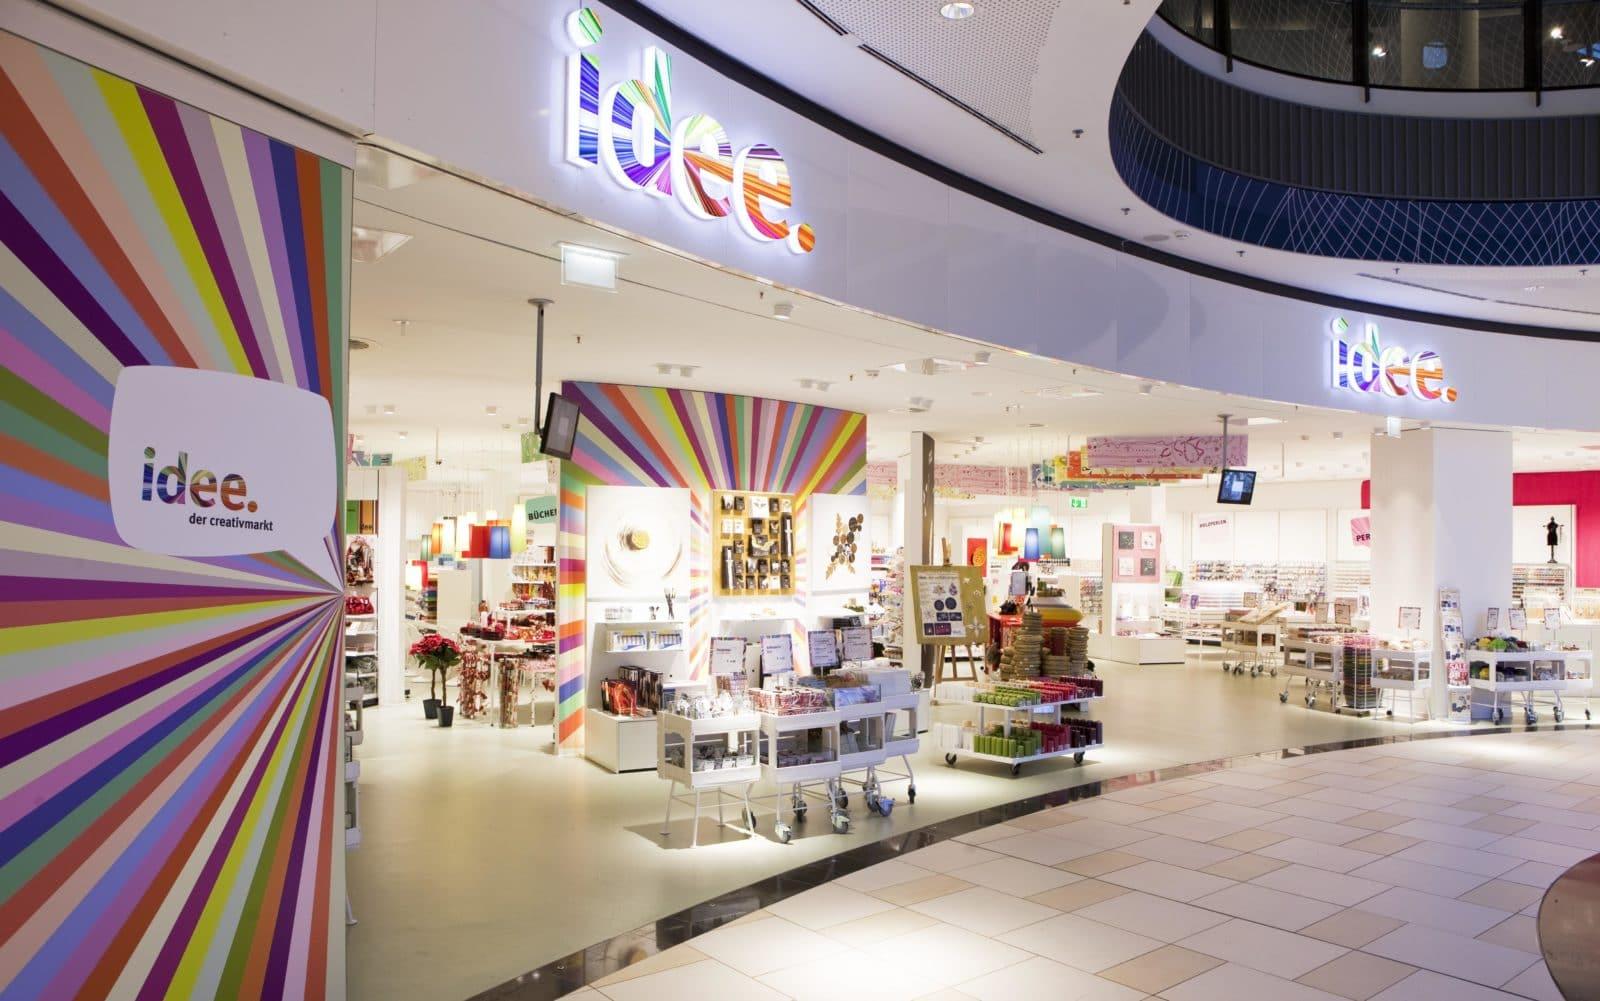 Idee creativmarkt gesch fte bei handmade kultur for Deko shop hannover